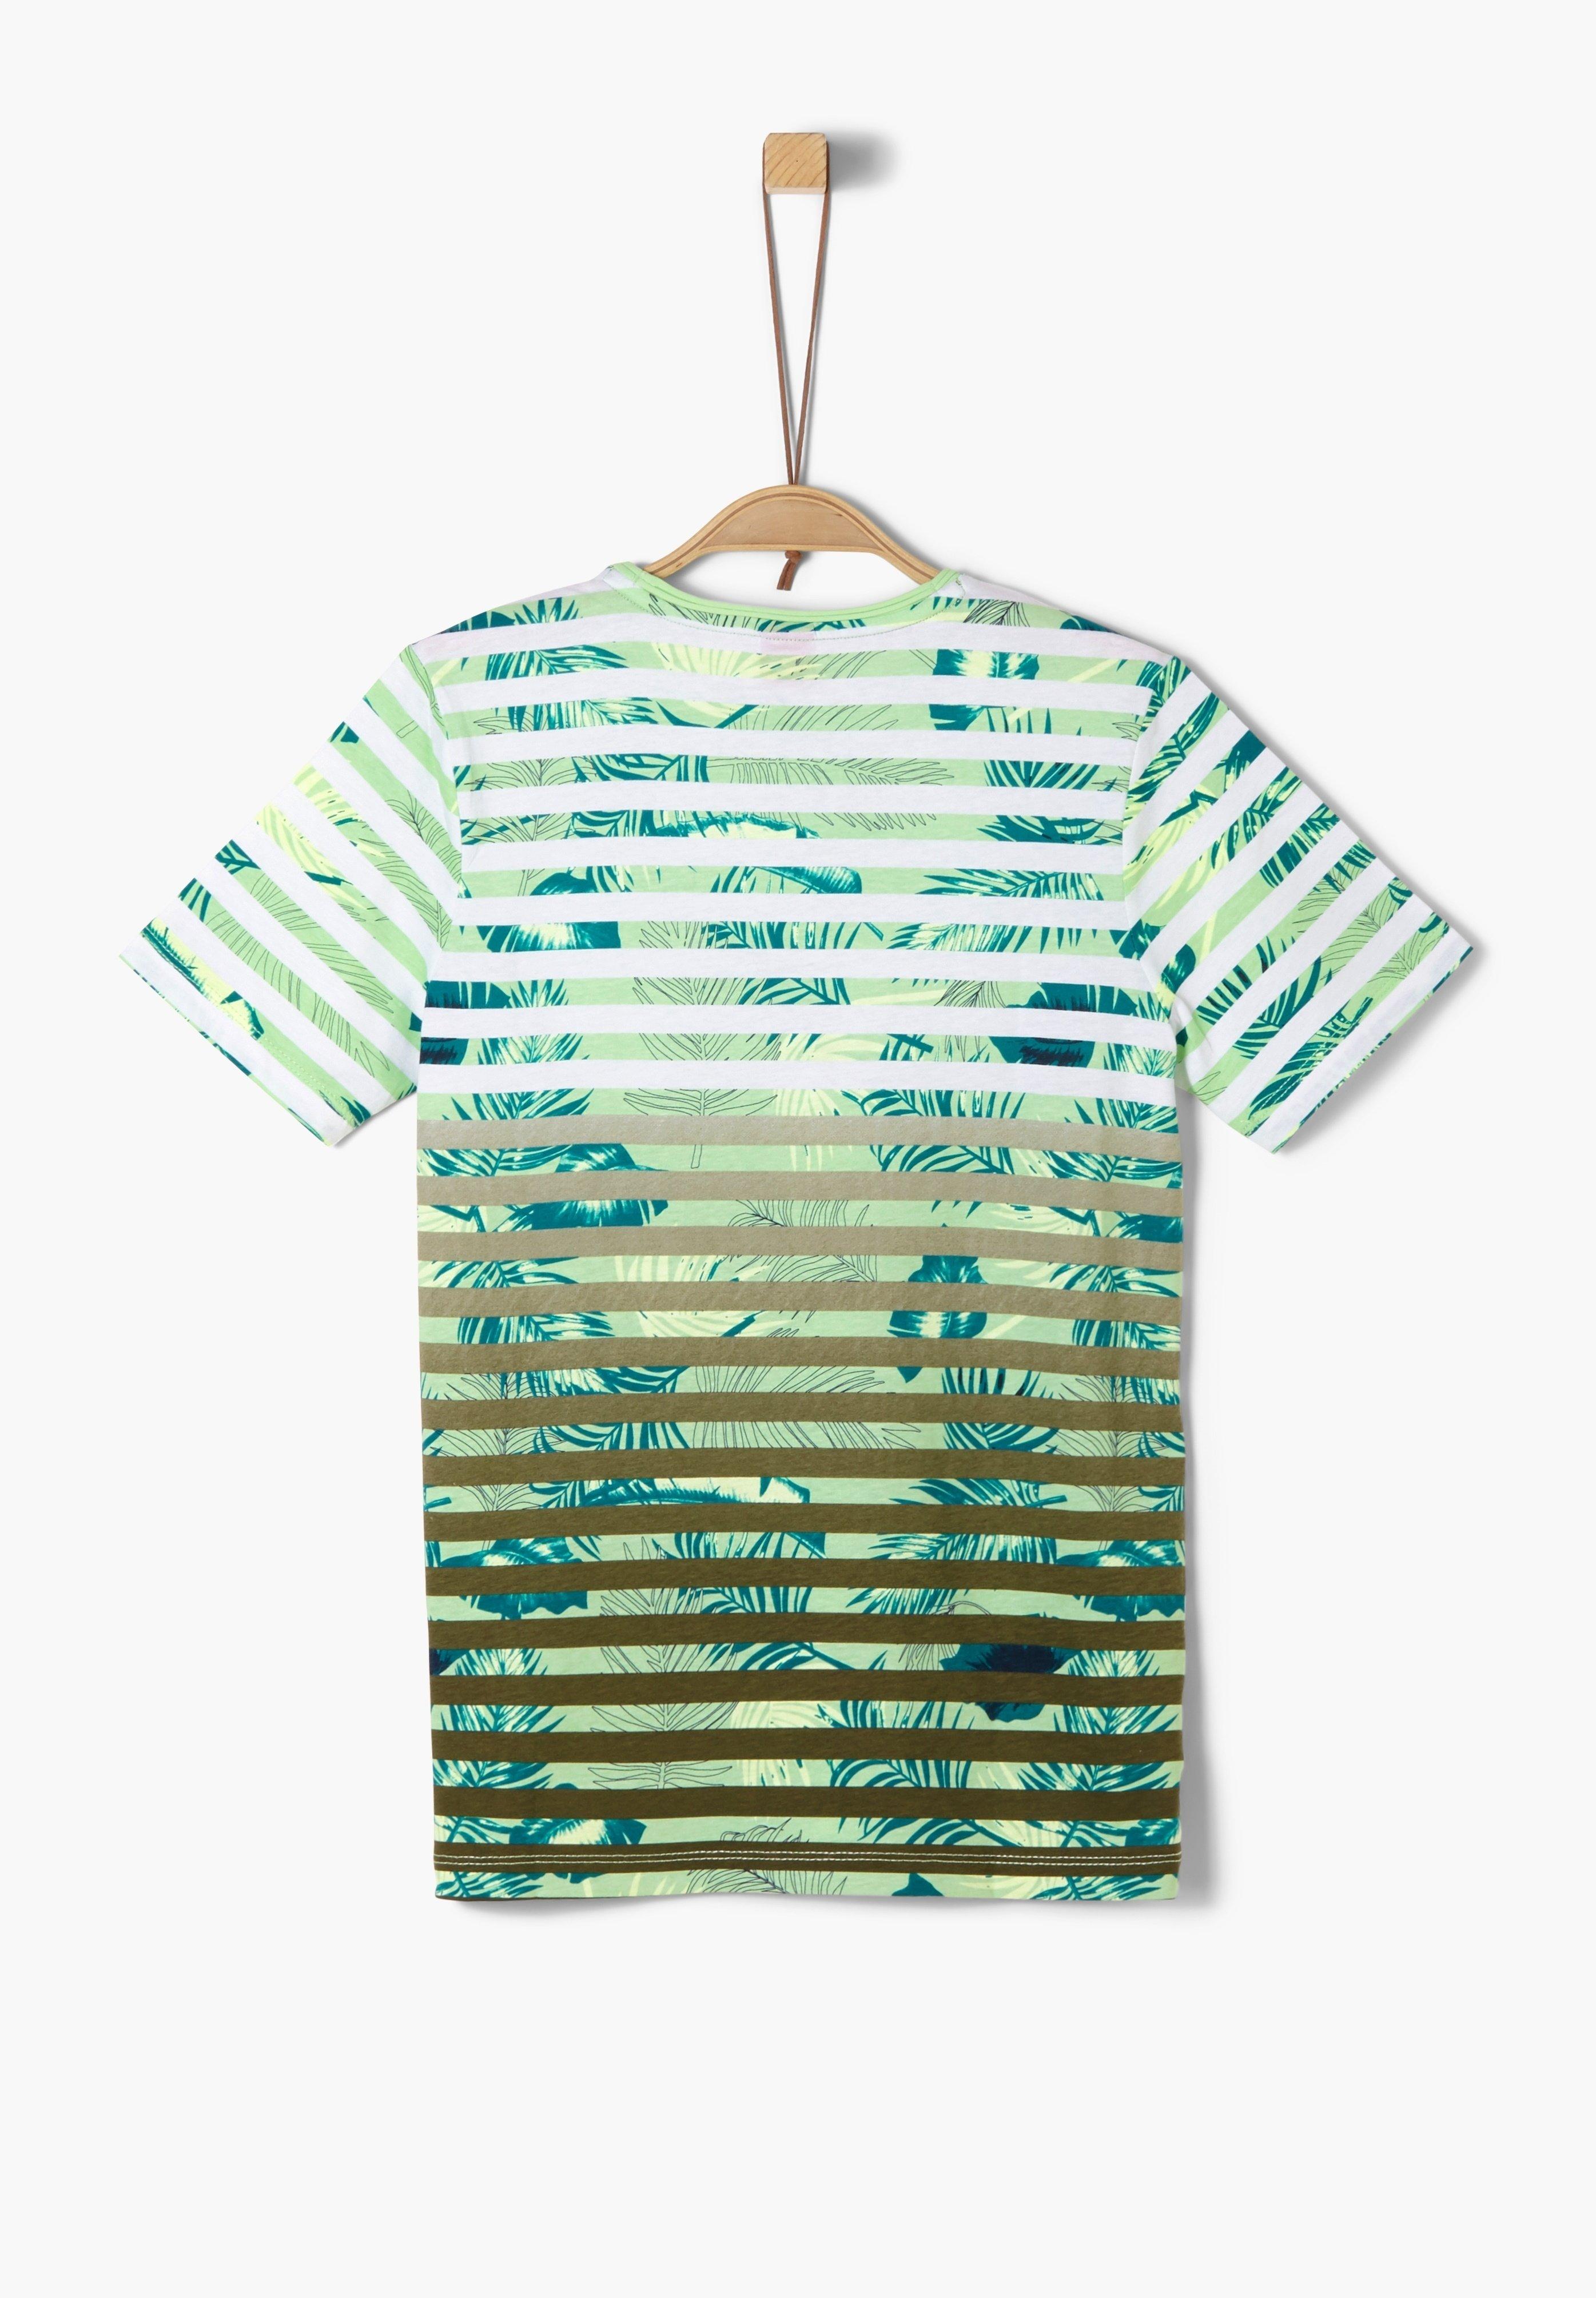 S.oliver Print T-shirt - Light Green Aop